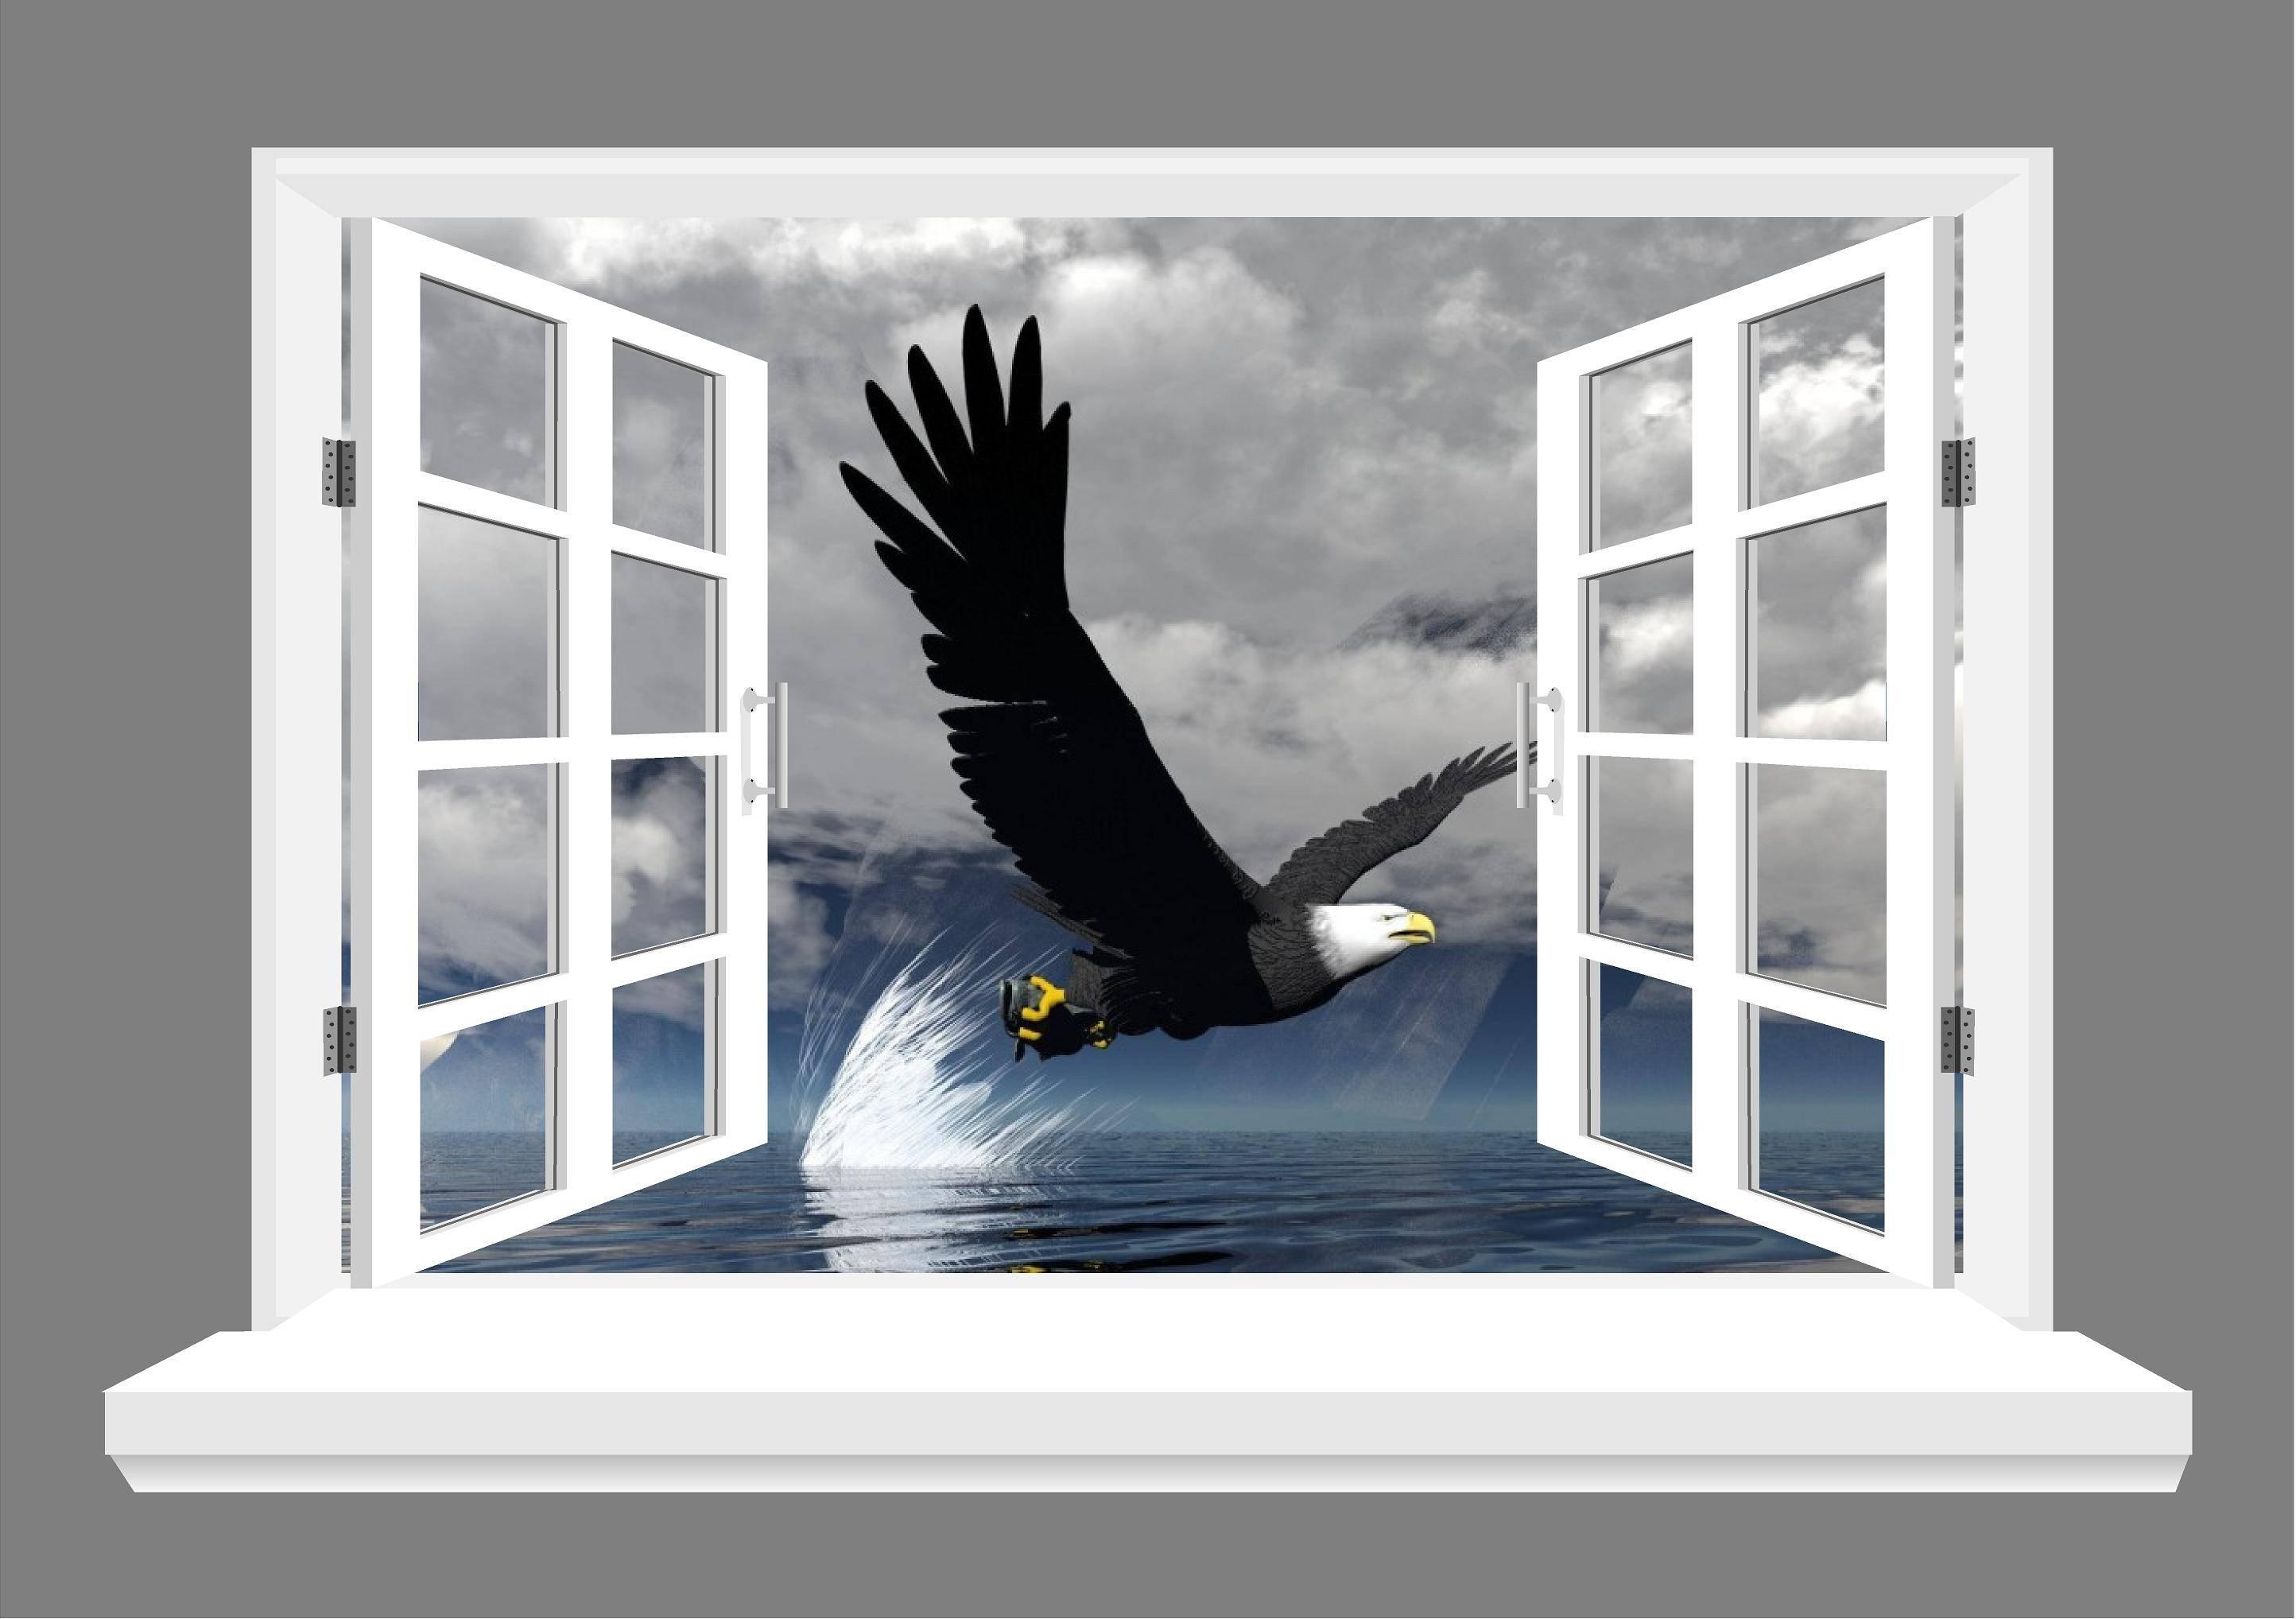 Wall Art Design Ideas: Eagly Flying 3D Wall Art Bird Windows For Best And Newest 3D Wall Art Window (View 19 of 20)